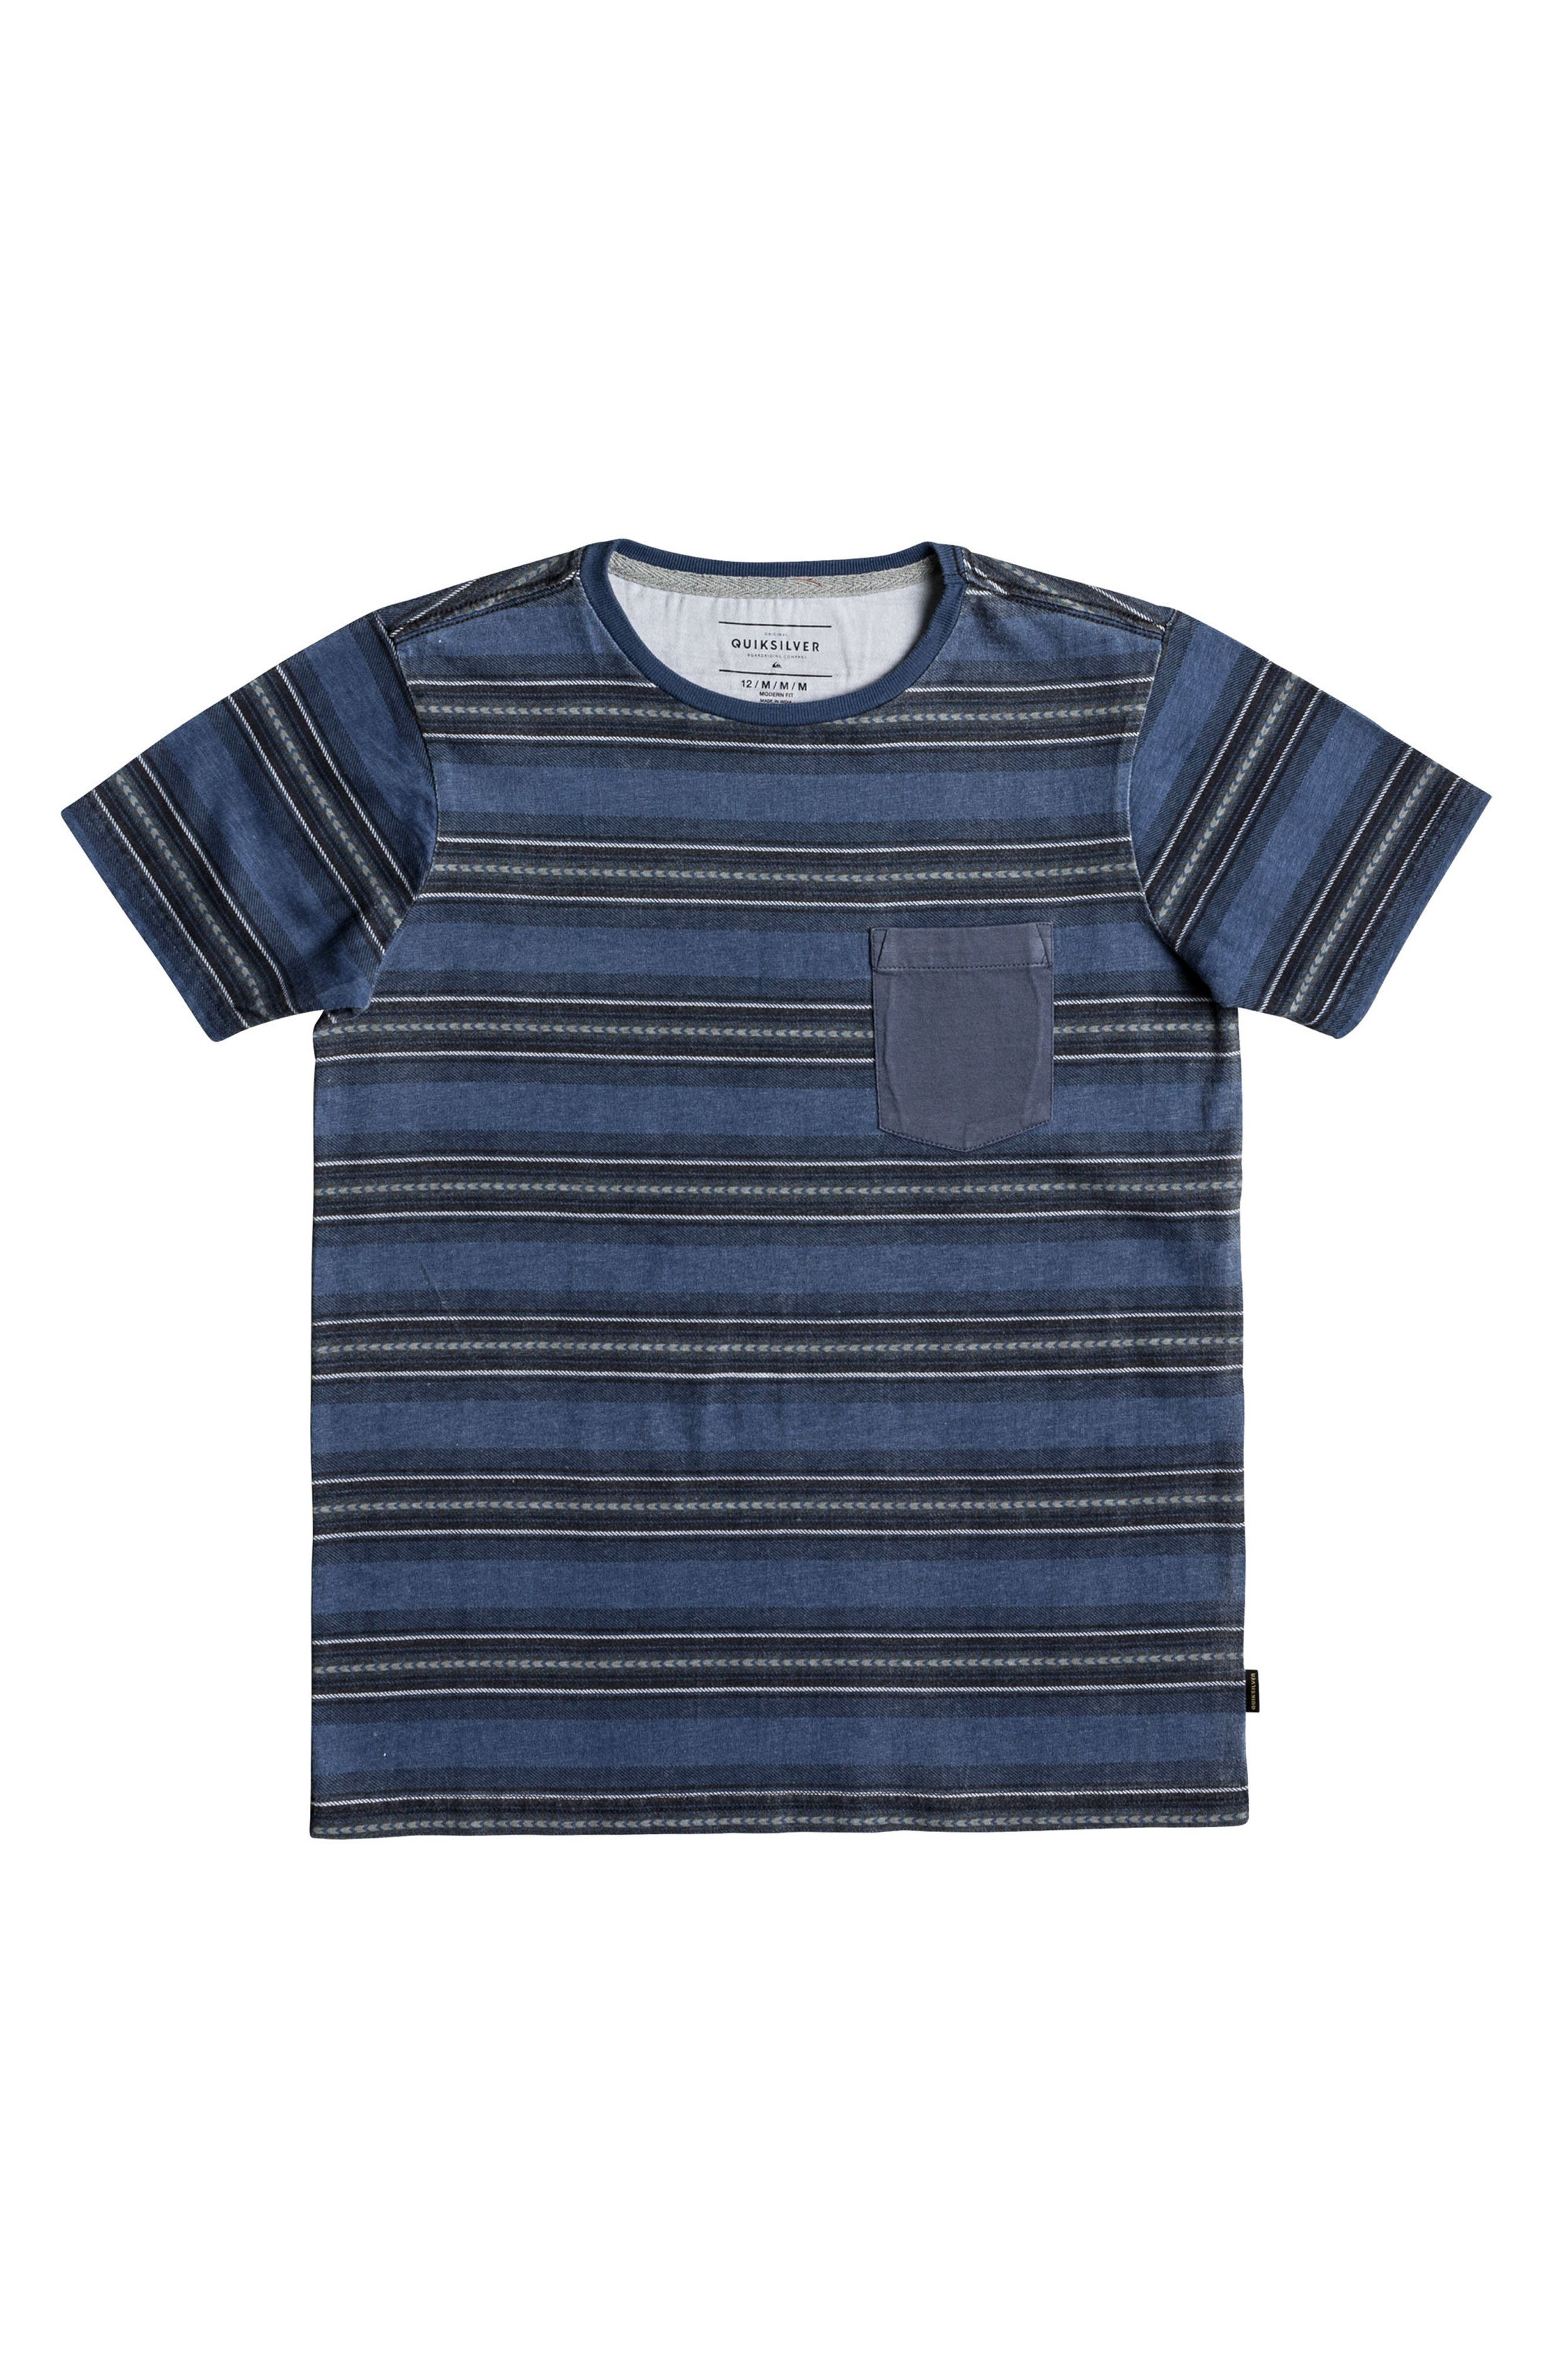 Main Image - Quiksilver Bayo Pocket T-Shirt (Big Boys)